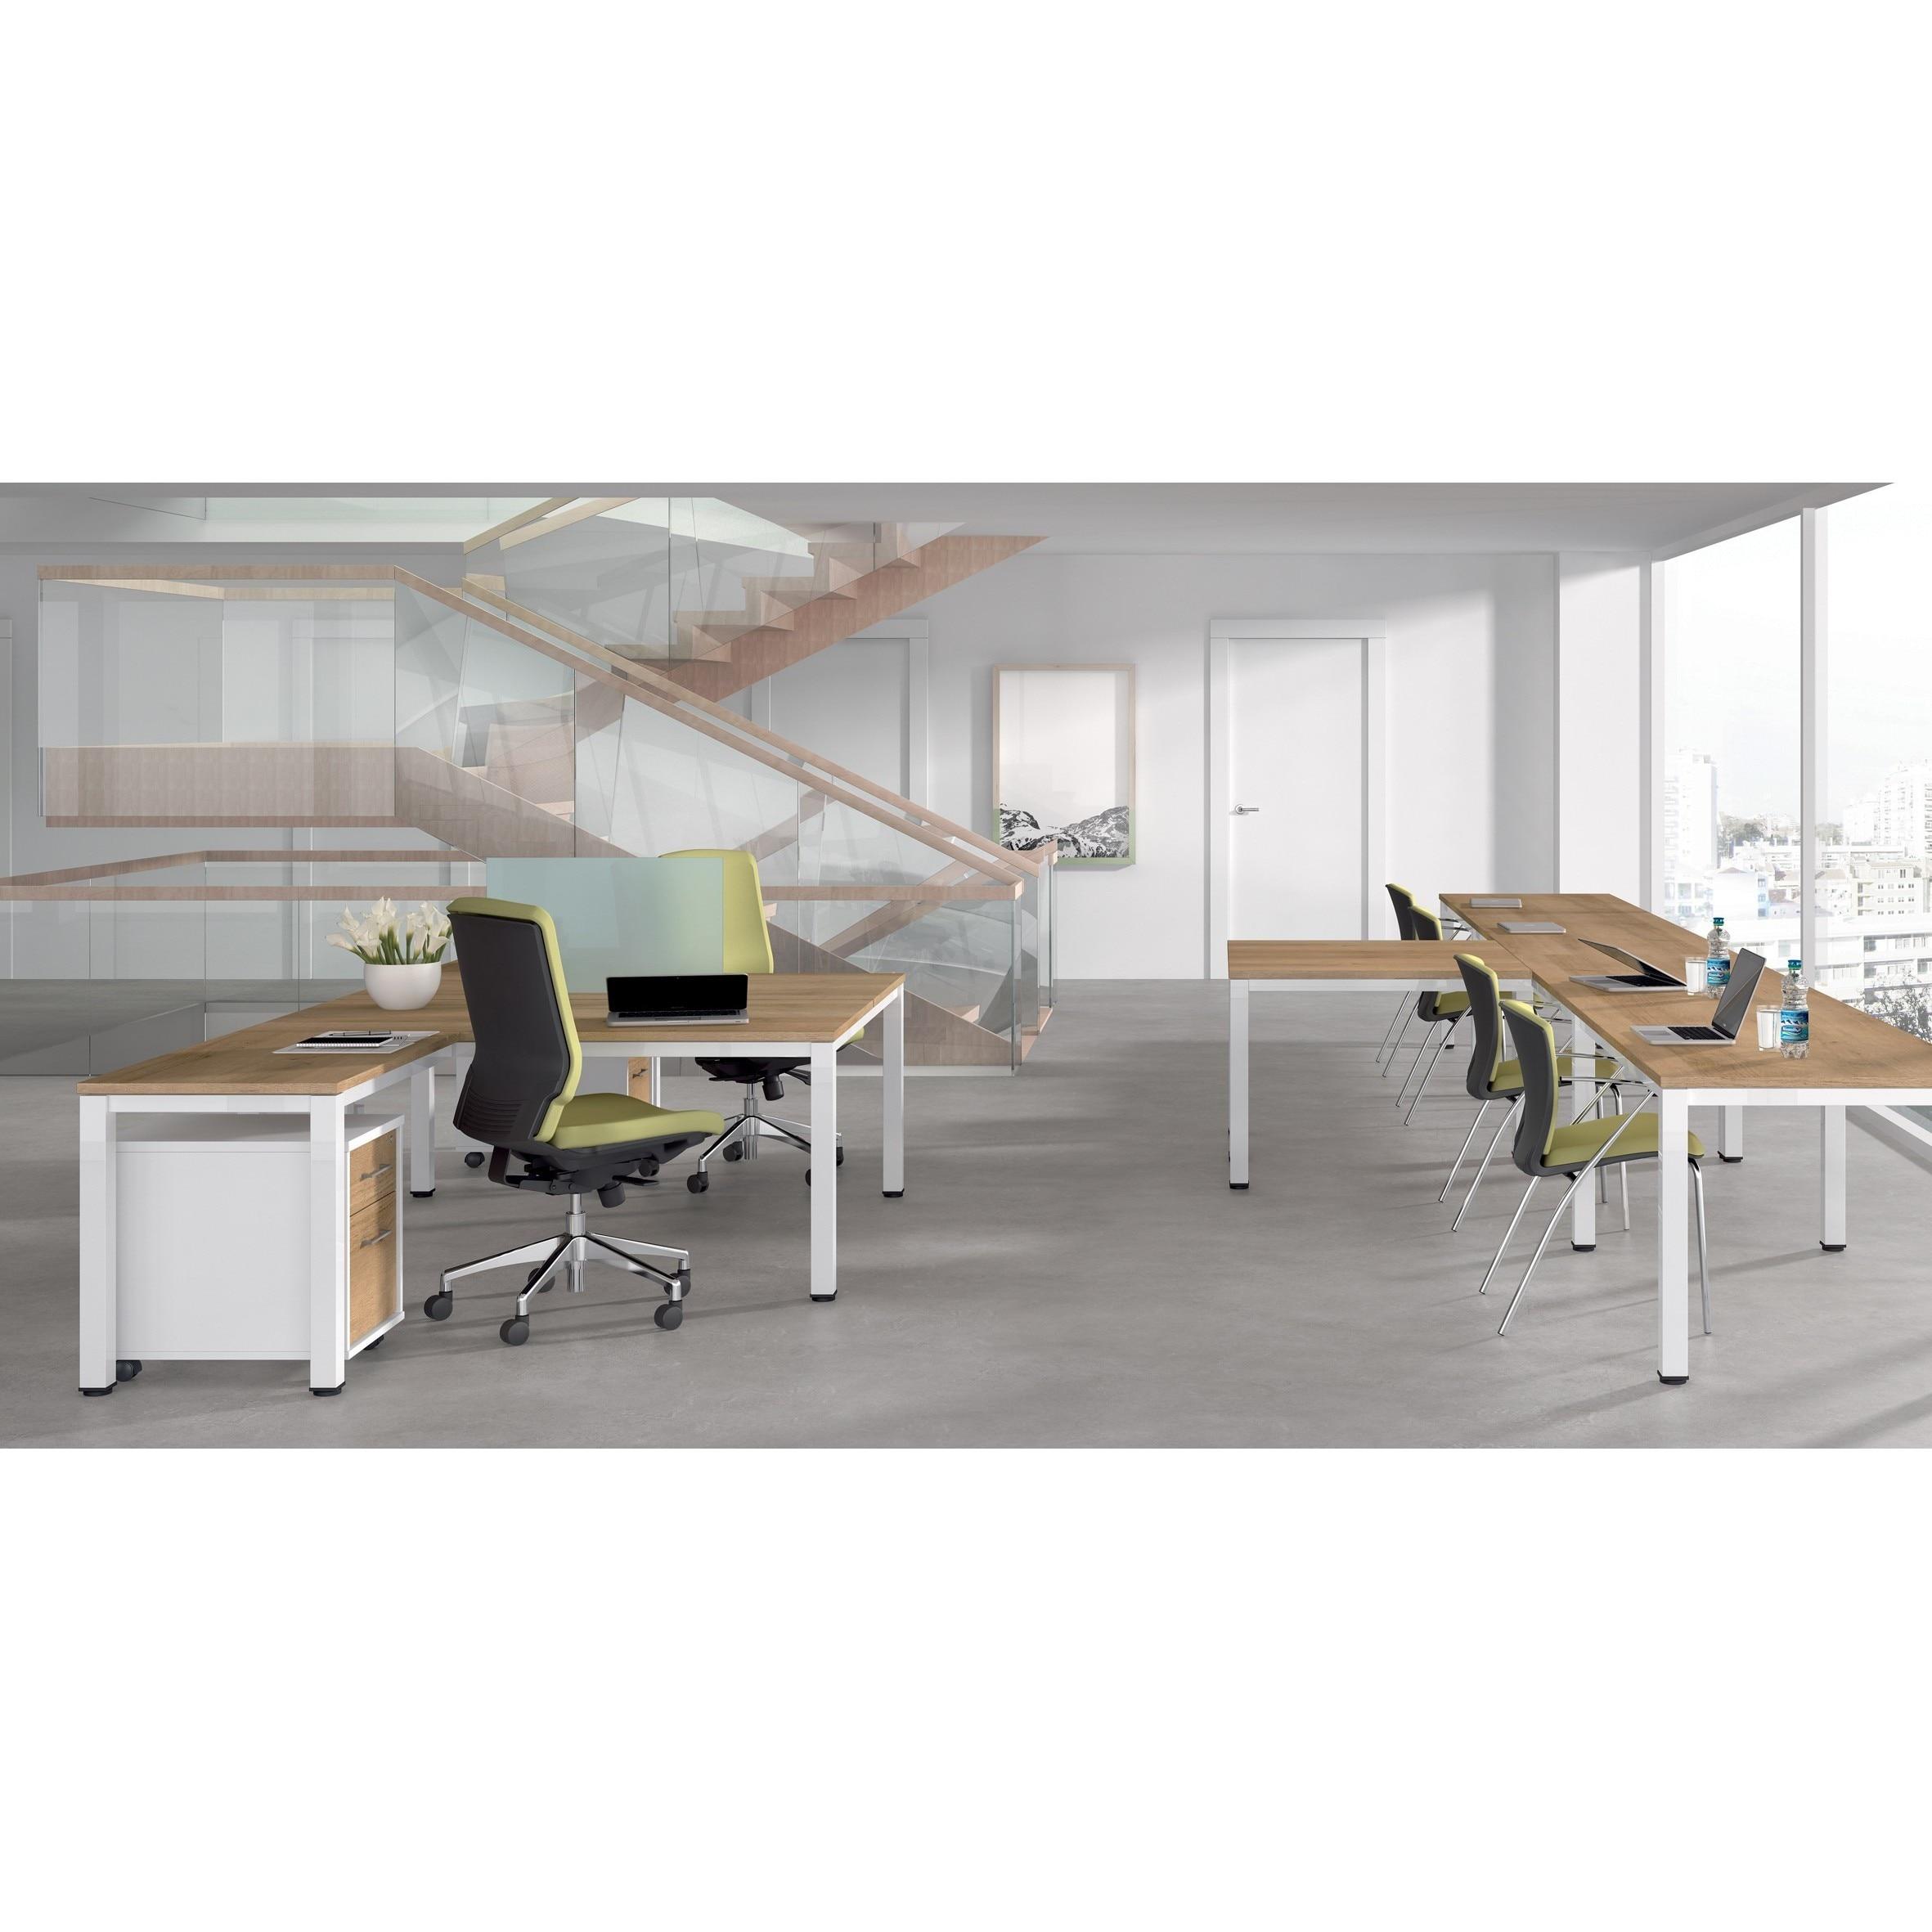 TABLE OFFICE 'S EXECUTIVE SERIES 160X80 CHROME/BEECH